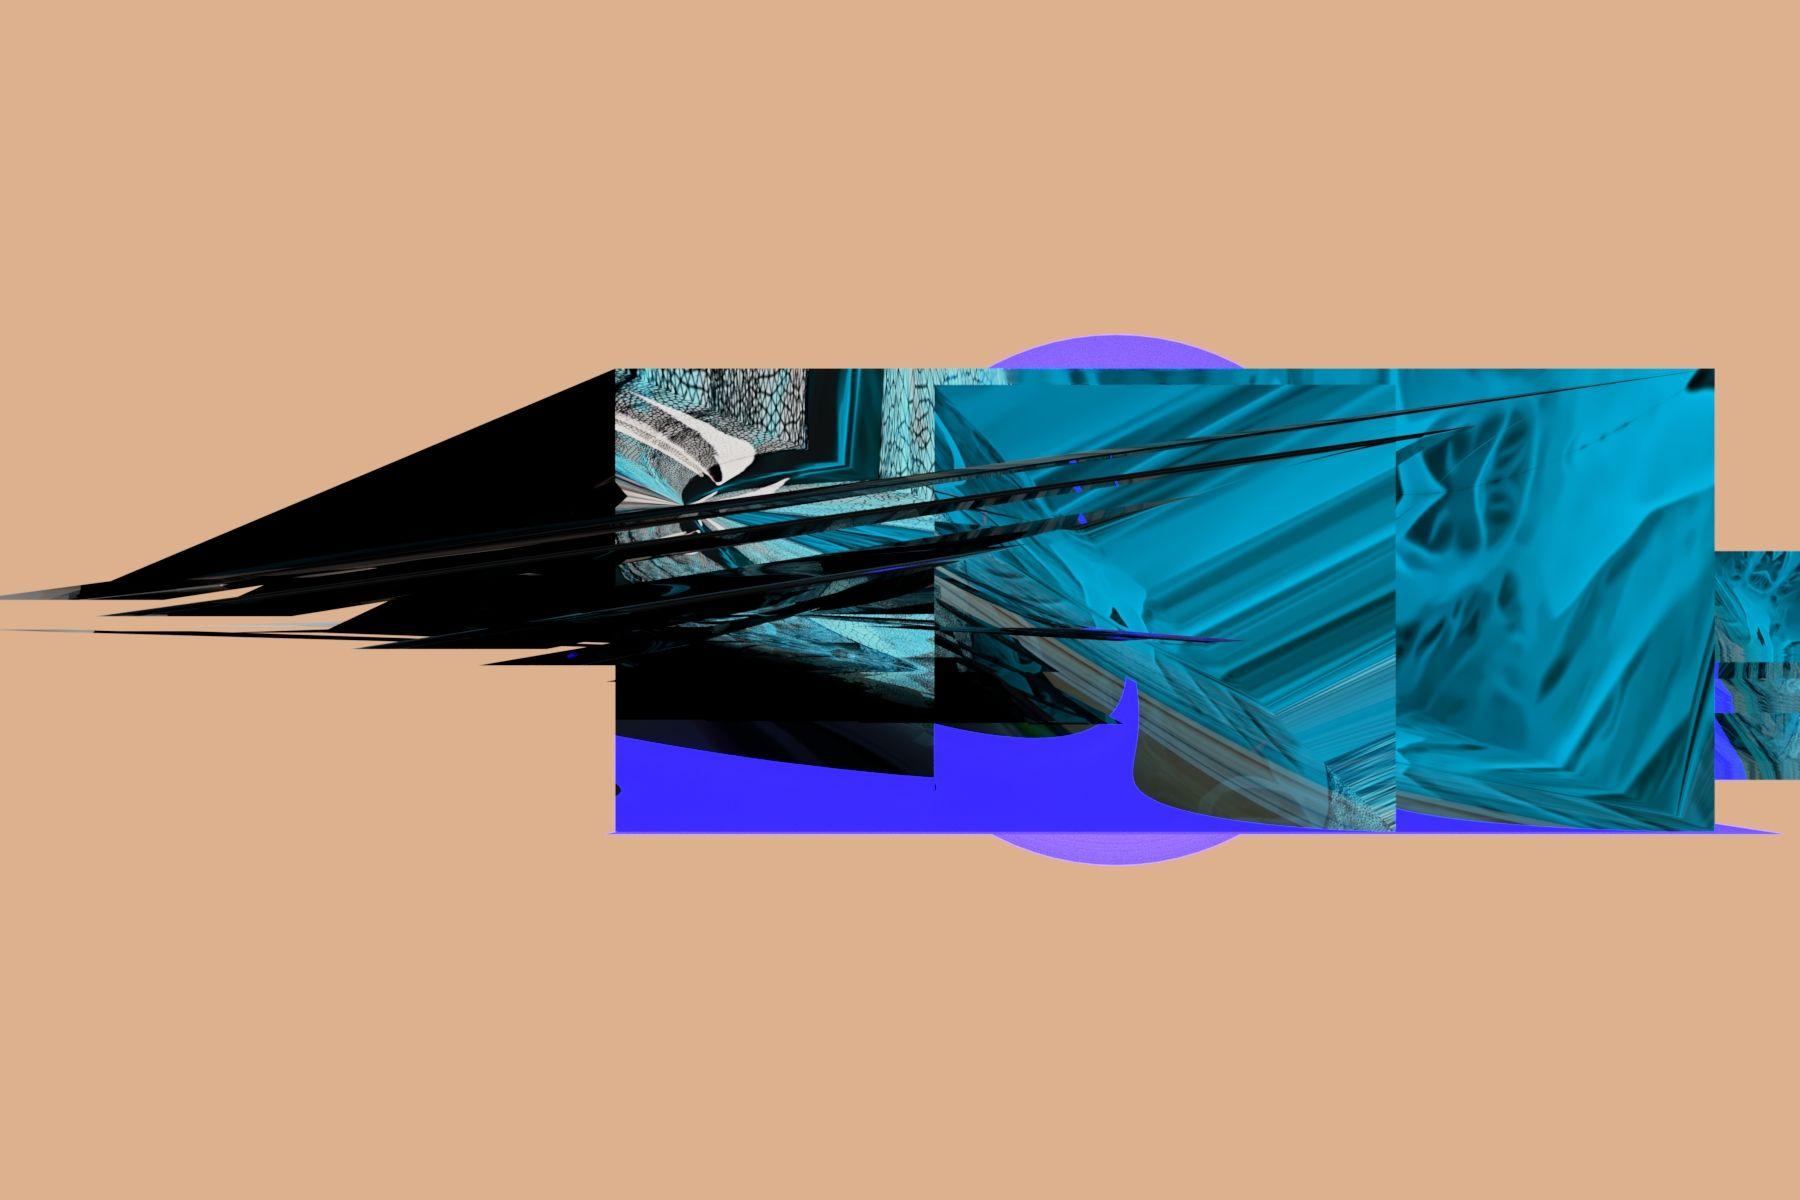 Raasrendering-d8478841-c319-42f5-ab0e-cc7494f62fb4-3500-3500